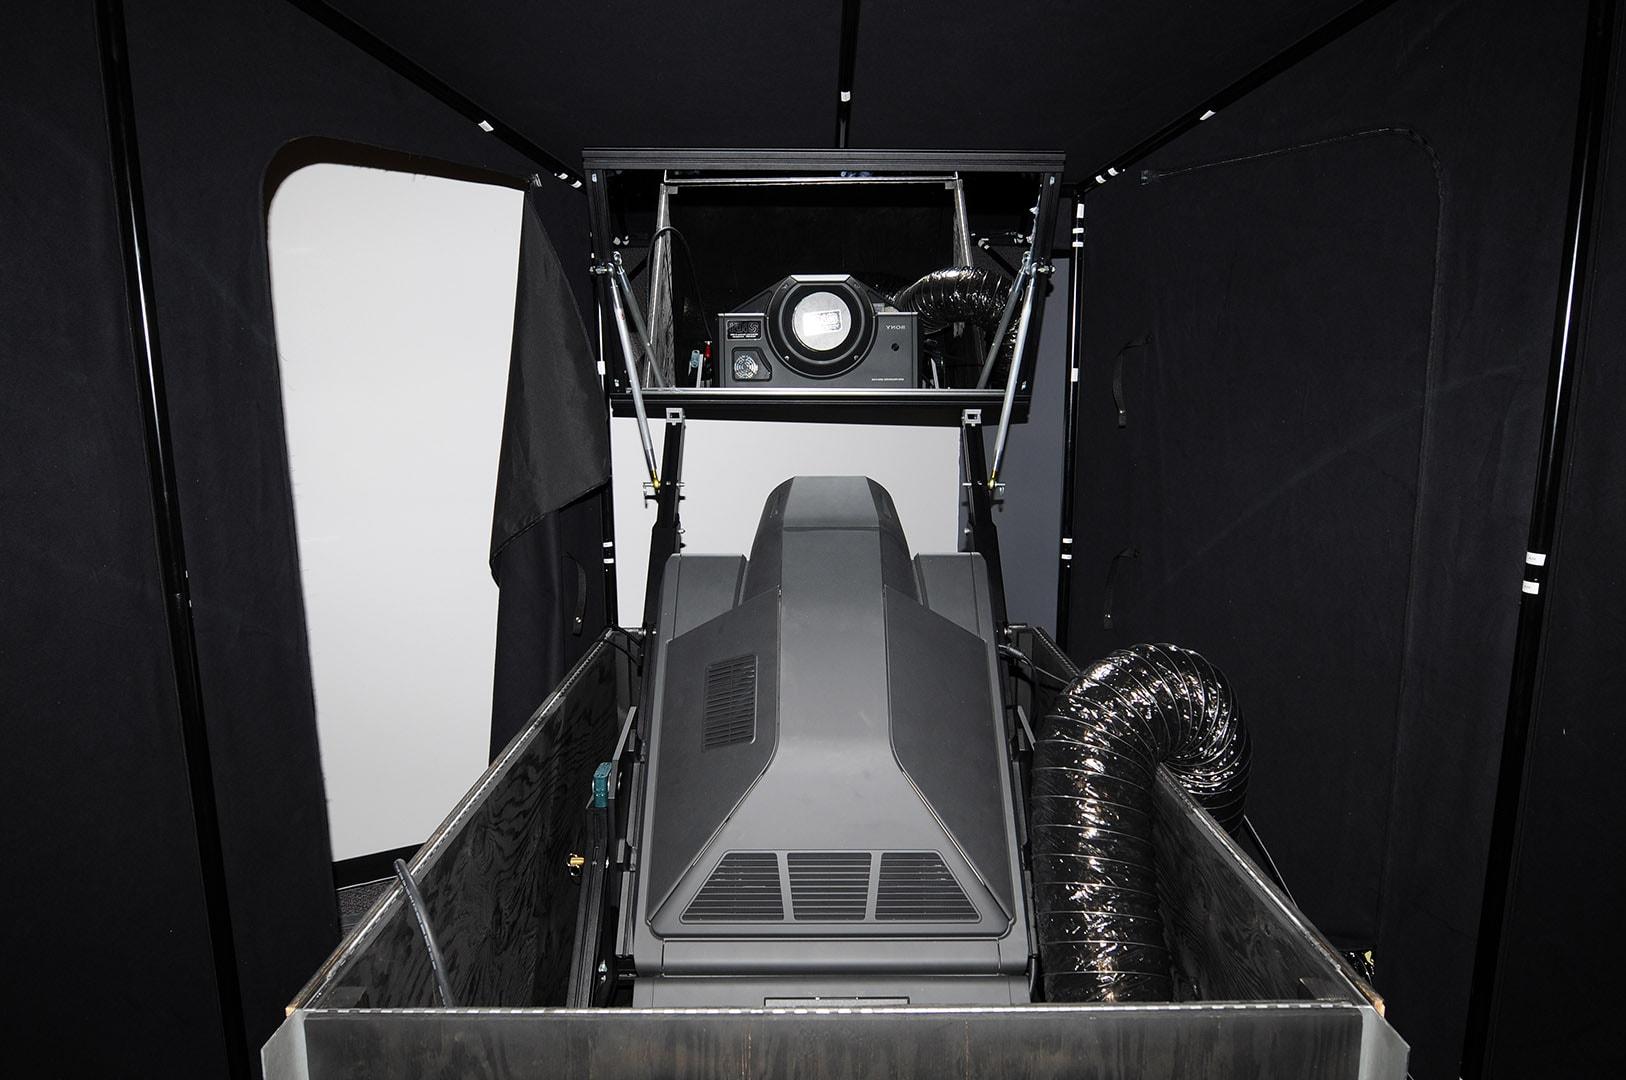 IGI 4K Powerwindow optical bounce projection system